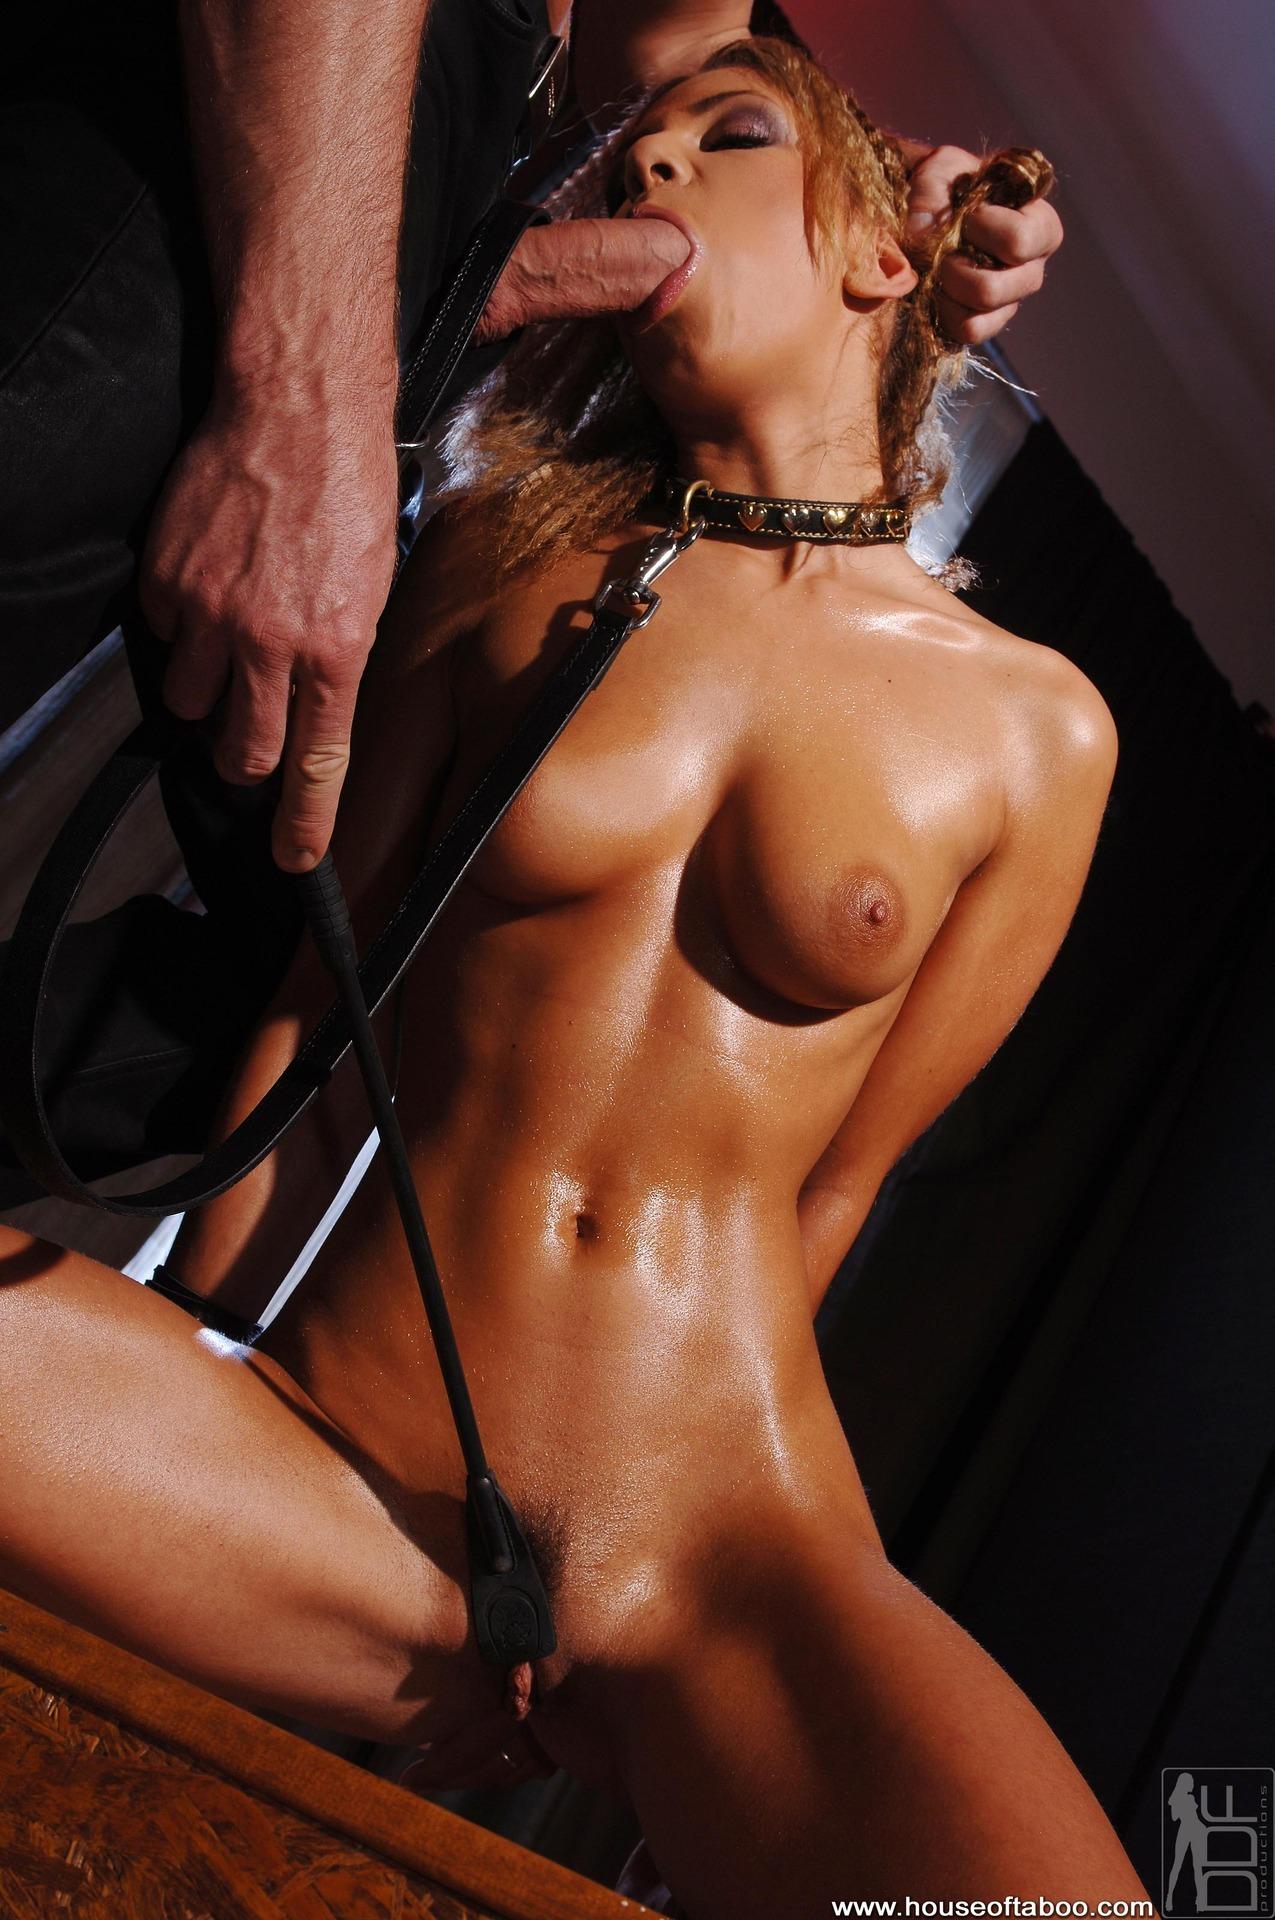 submissive girls tumblr